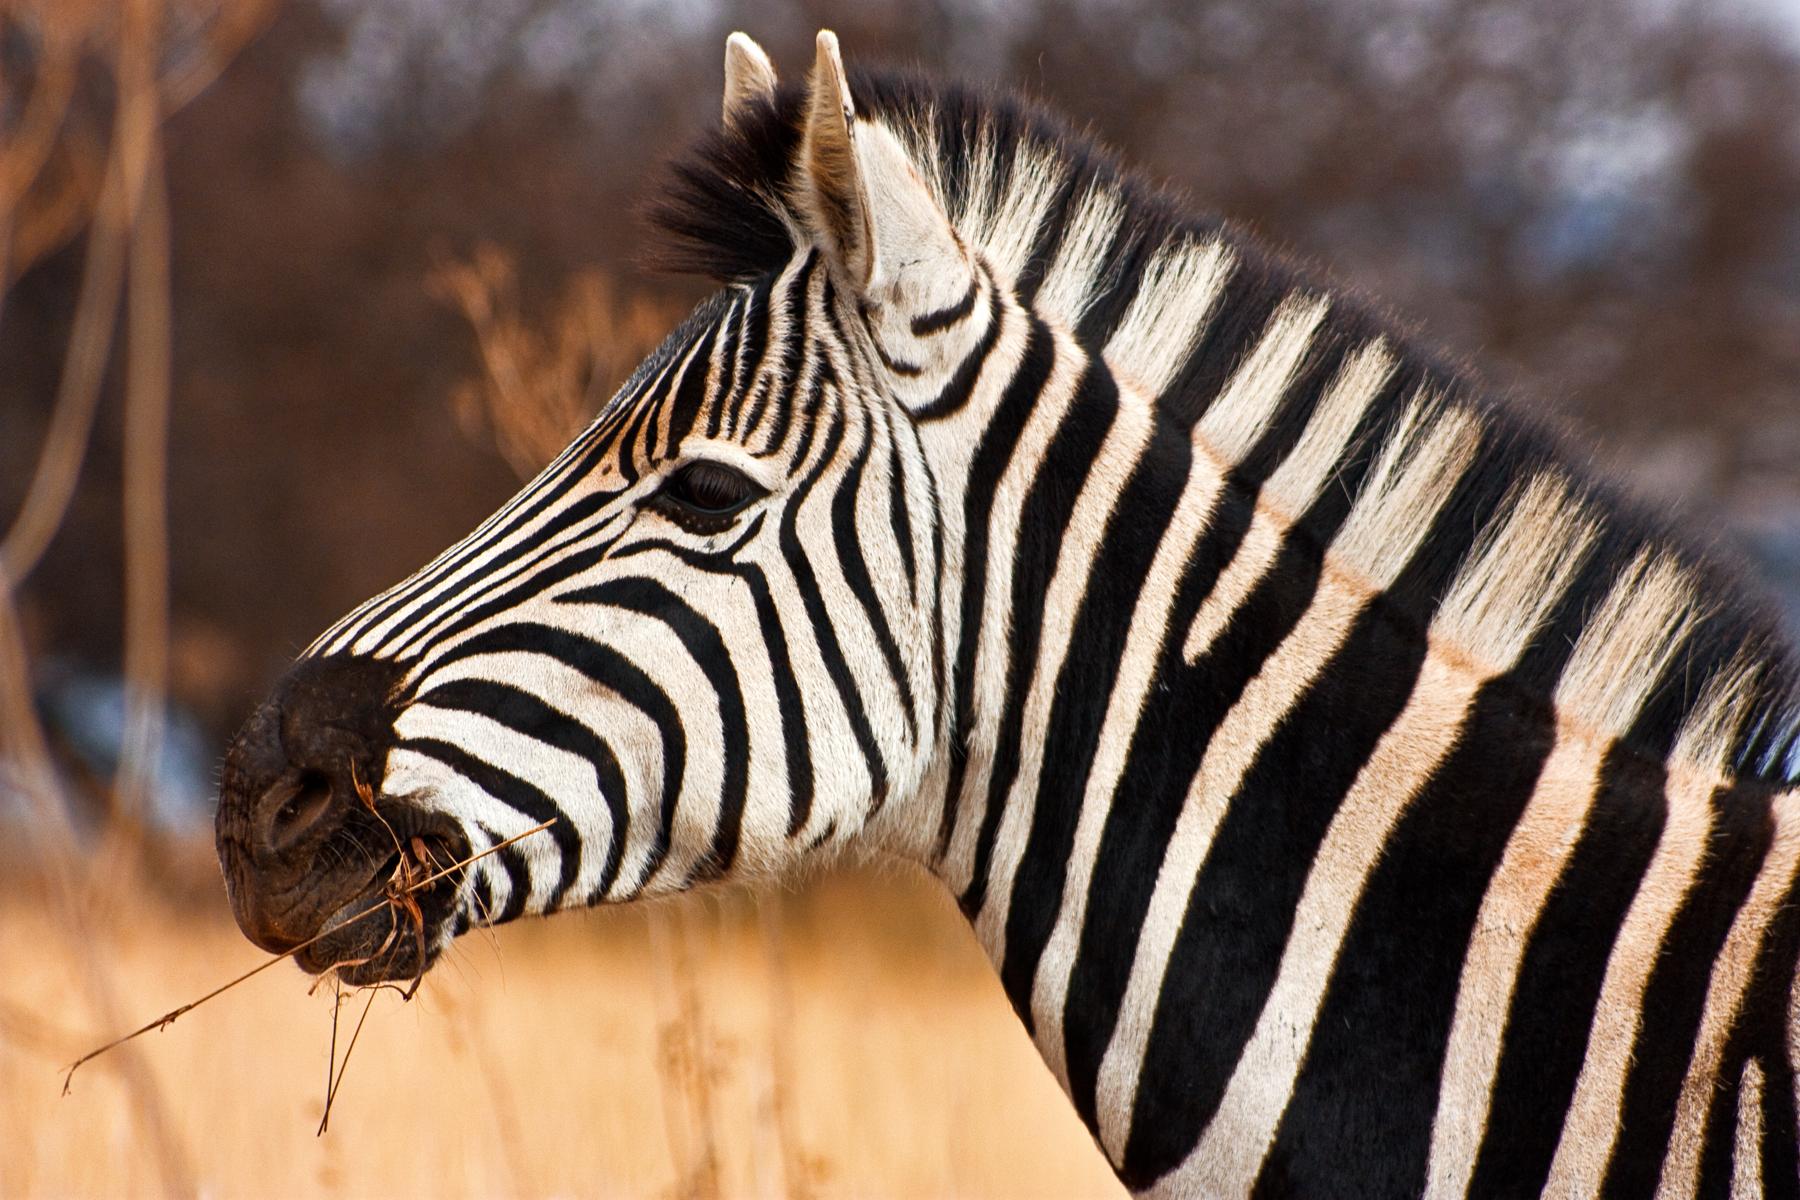 Zebra close-up photo